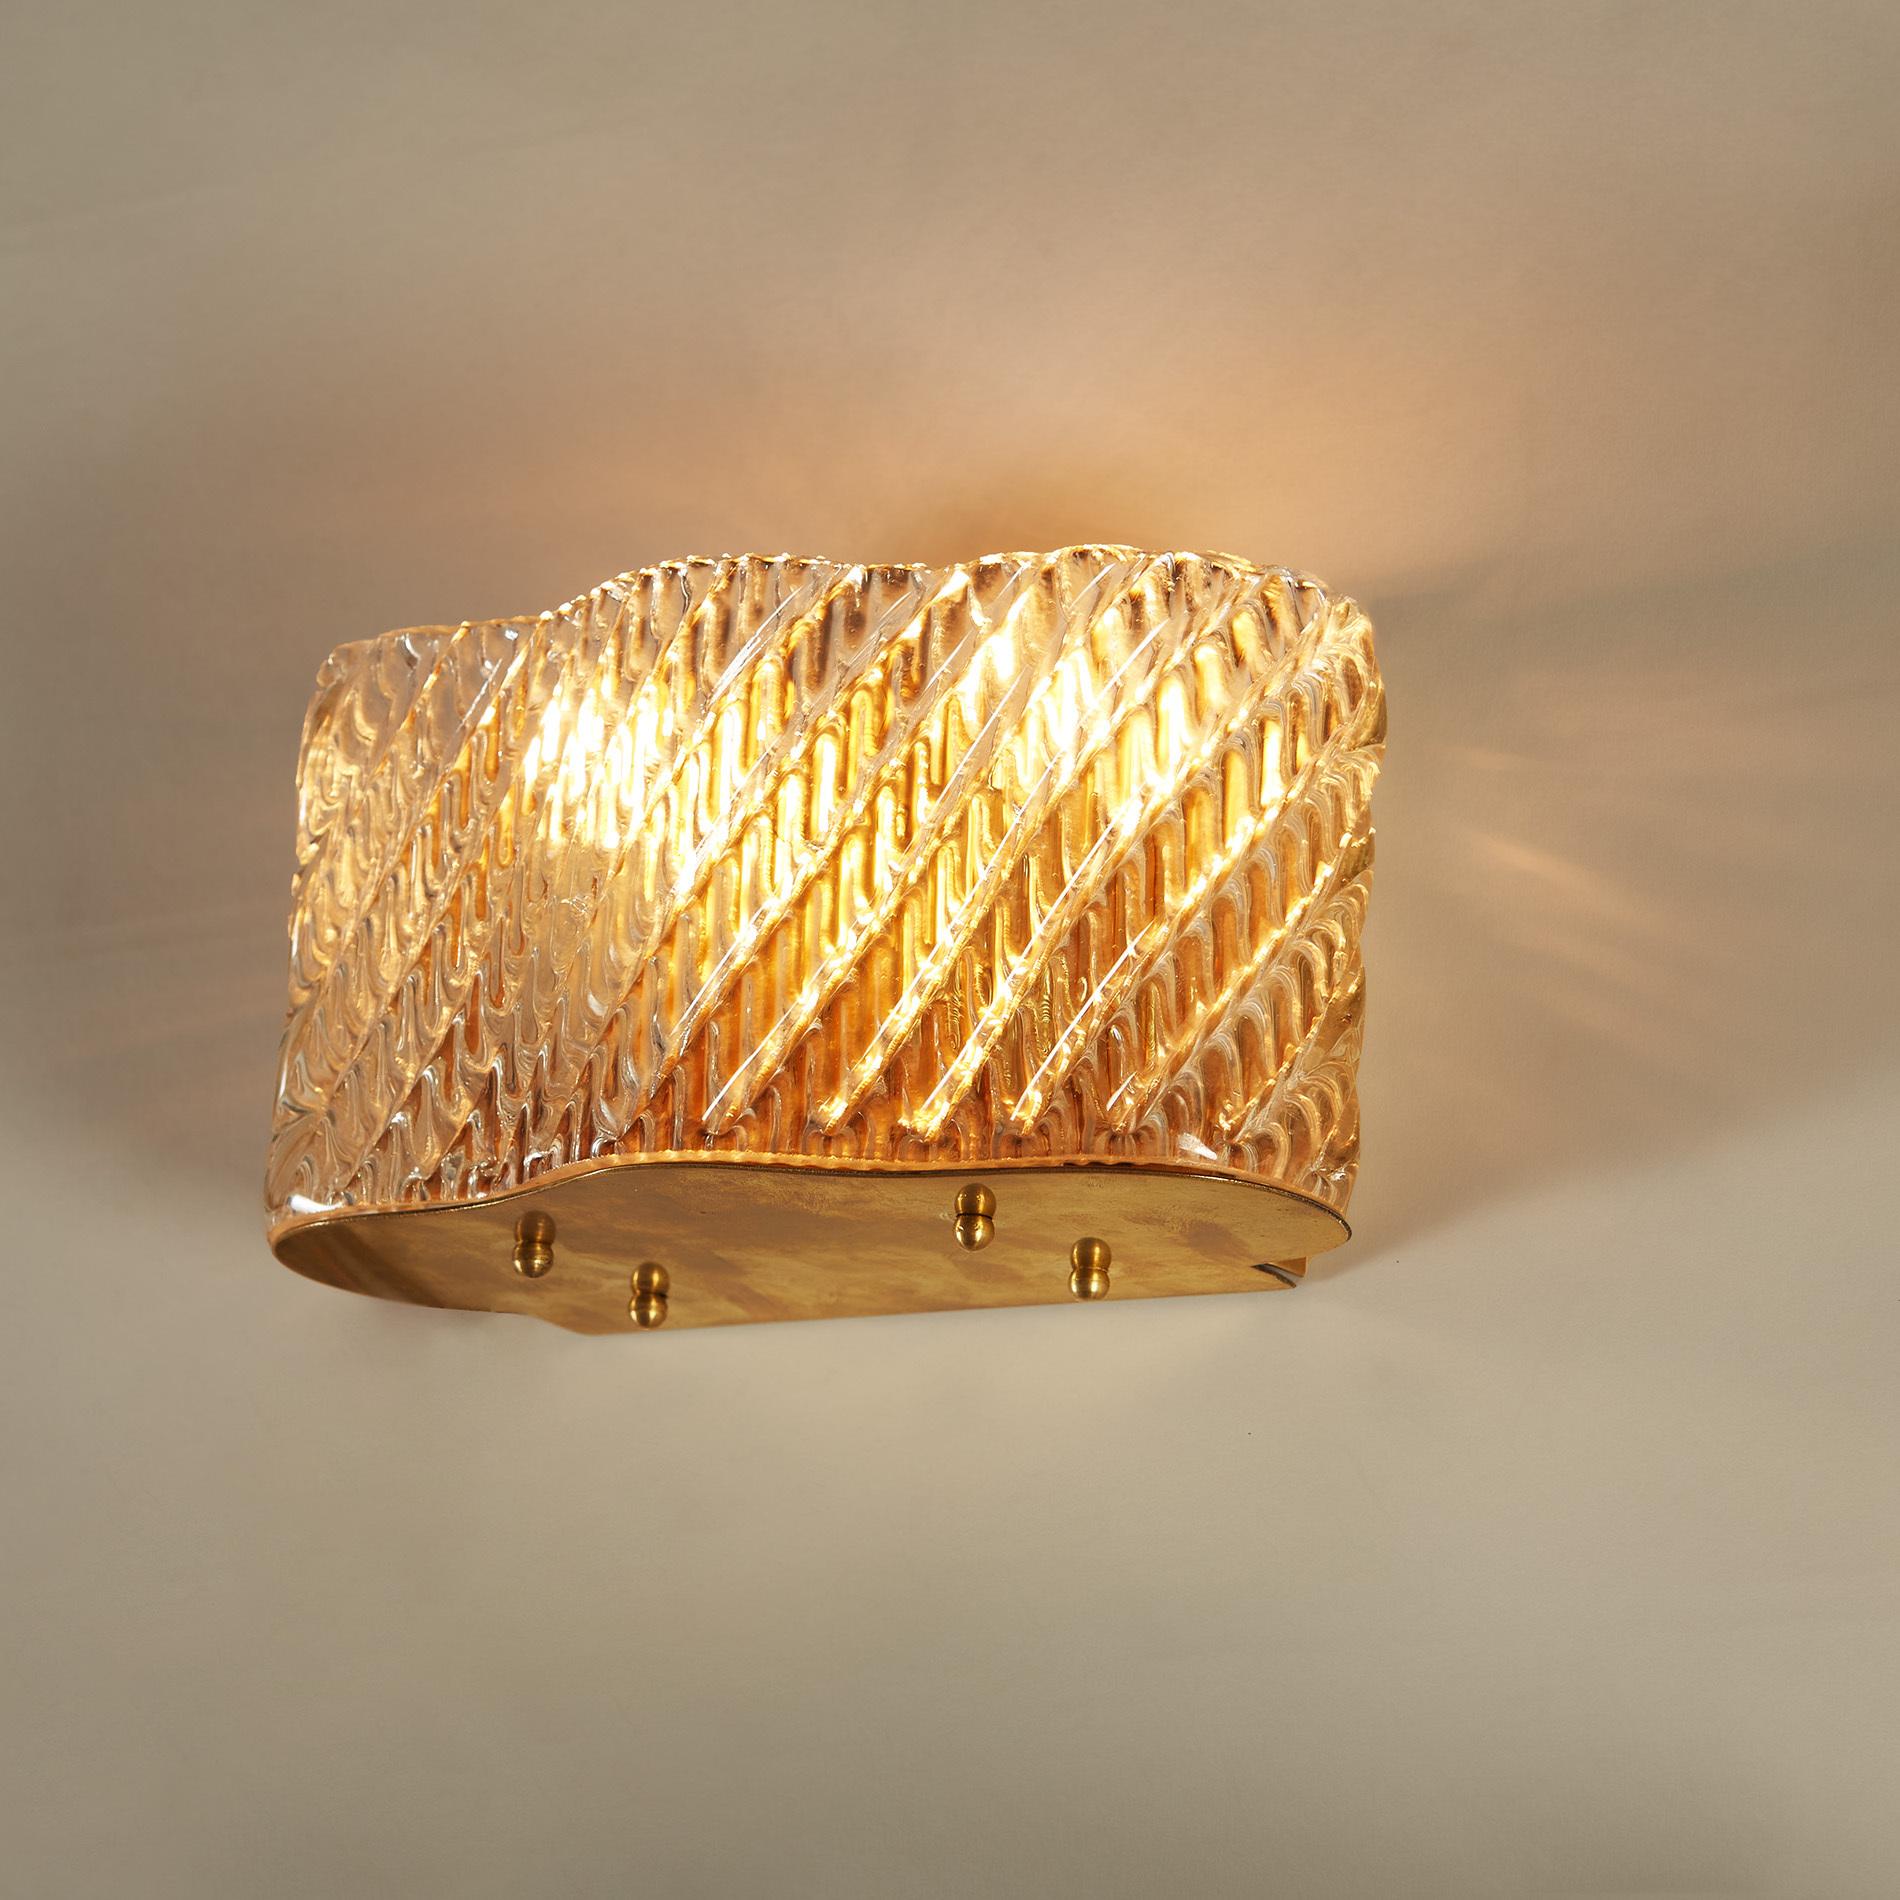 Seguso Diagonal Glass Wall Lights 20210427 Valerie Wade 4 0284 V1